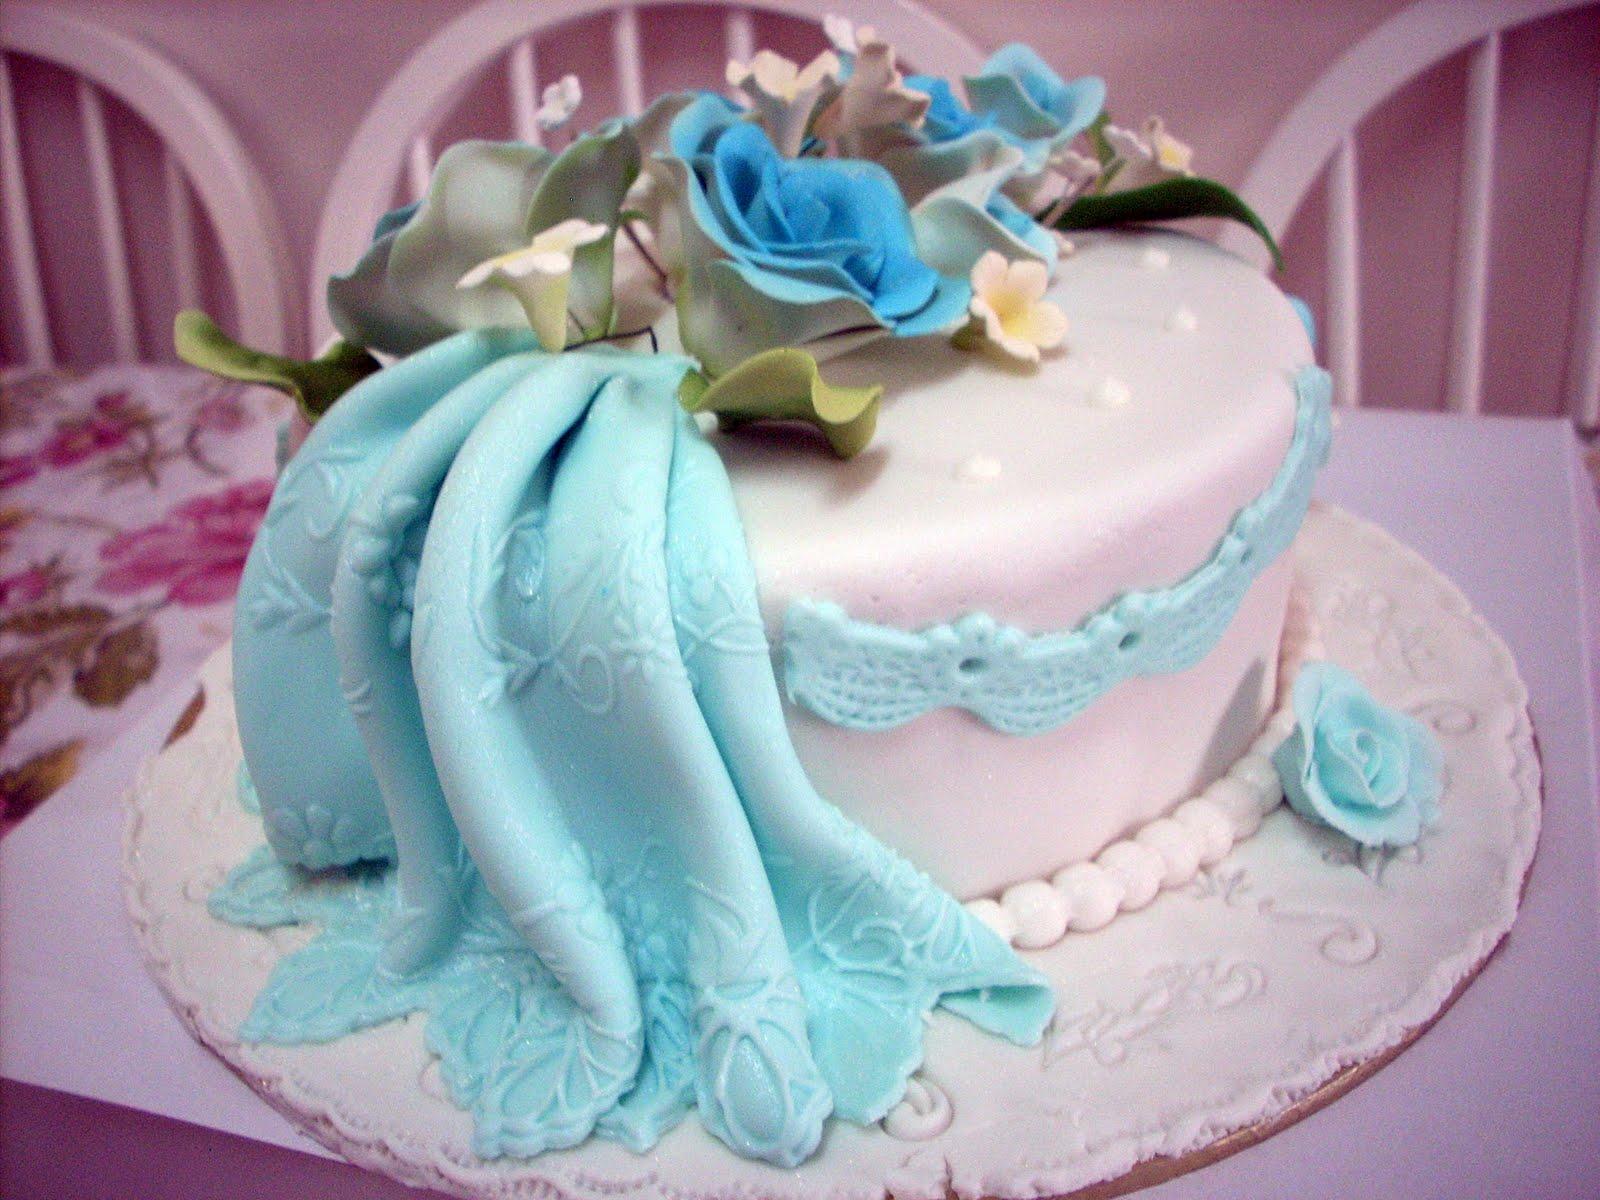 Arz Bakery Cakes